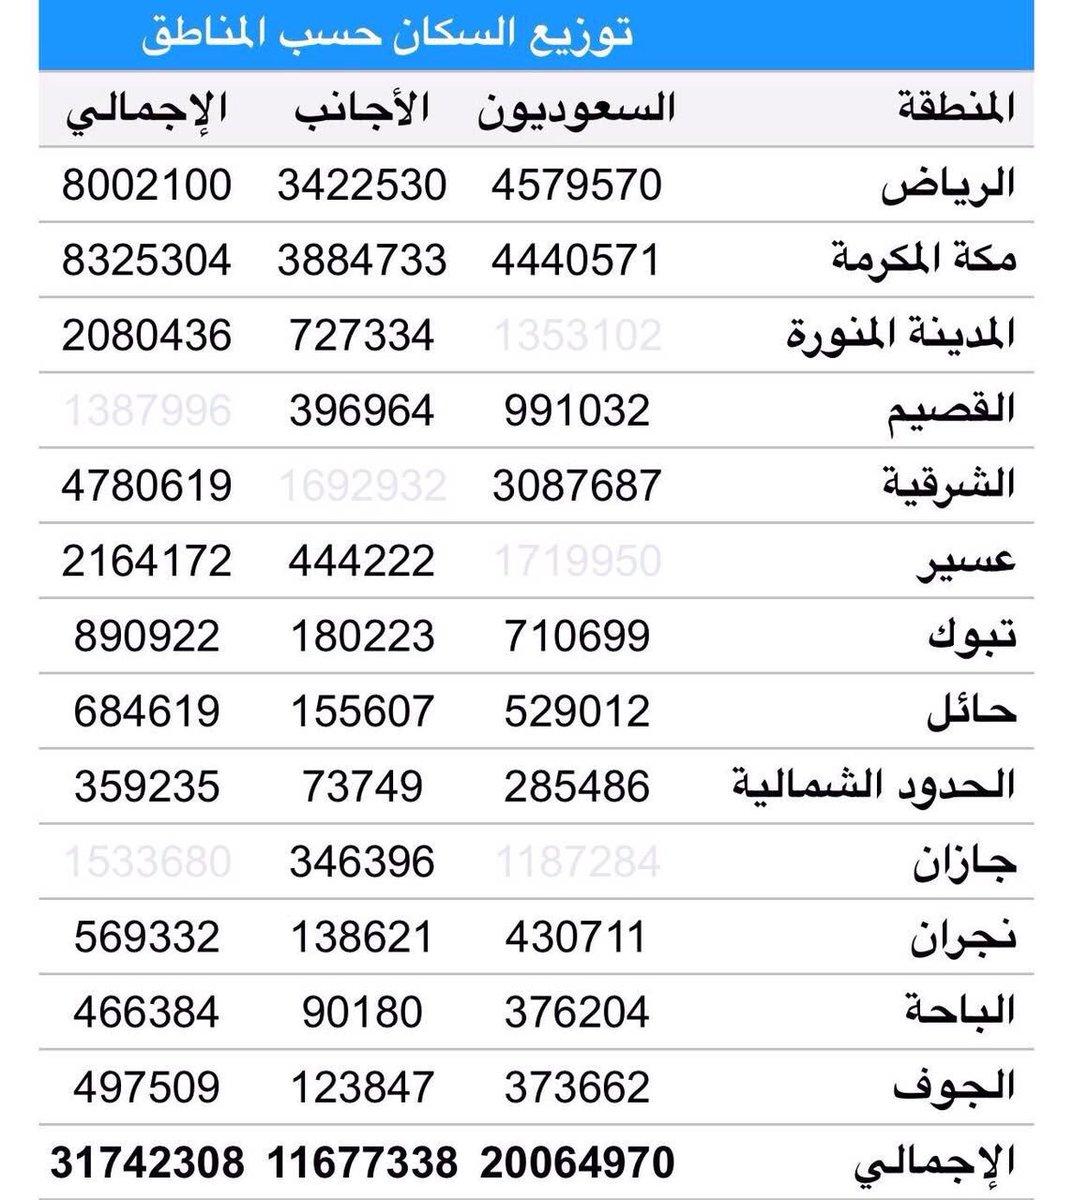 O Xrhsths أخبار السعودية Sto Twitter هيئة الإحصاء عدد سكان المملكة بلغ ٣١ ٧٤ مليون نسمة والحدود الشمالية الأقل من بين المناطق